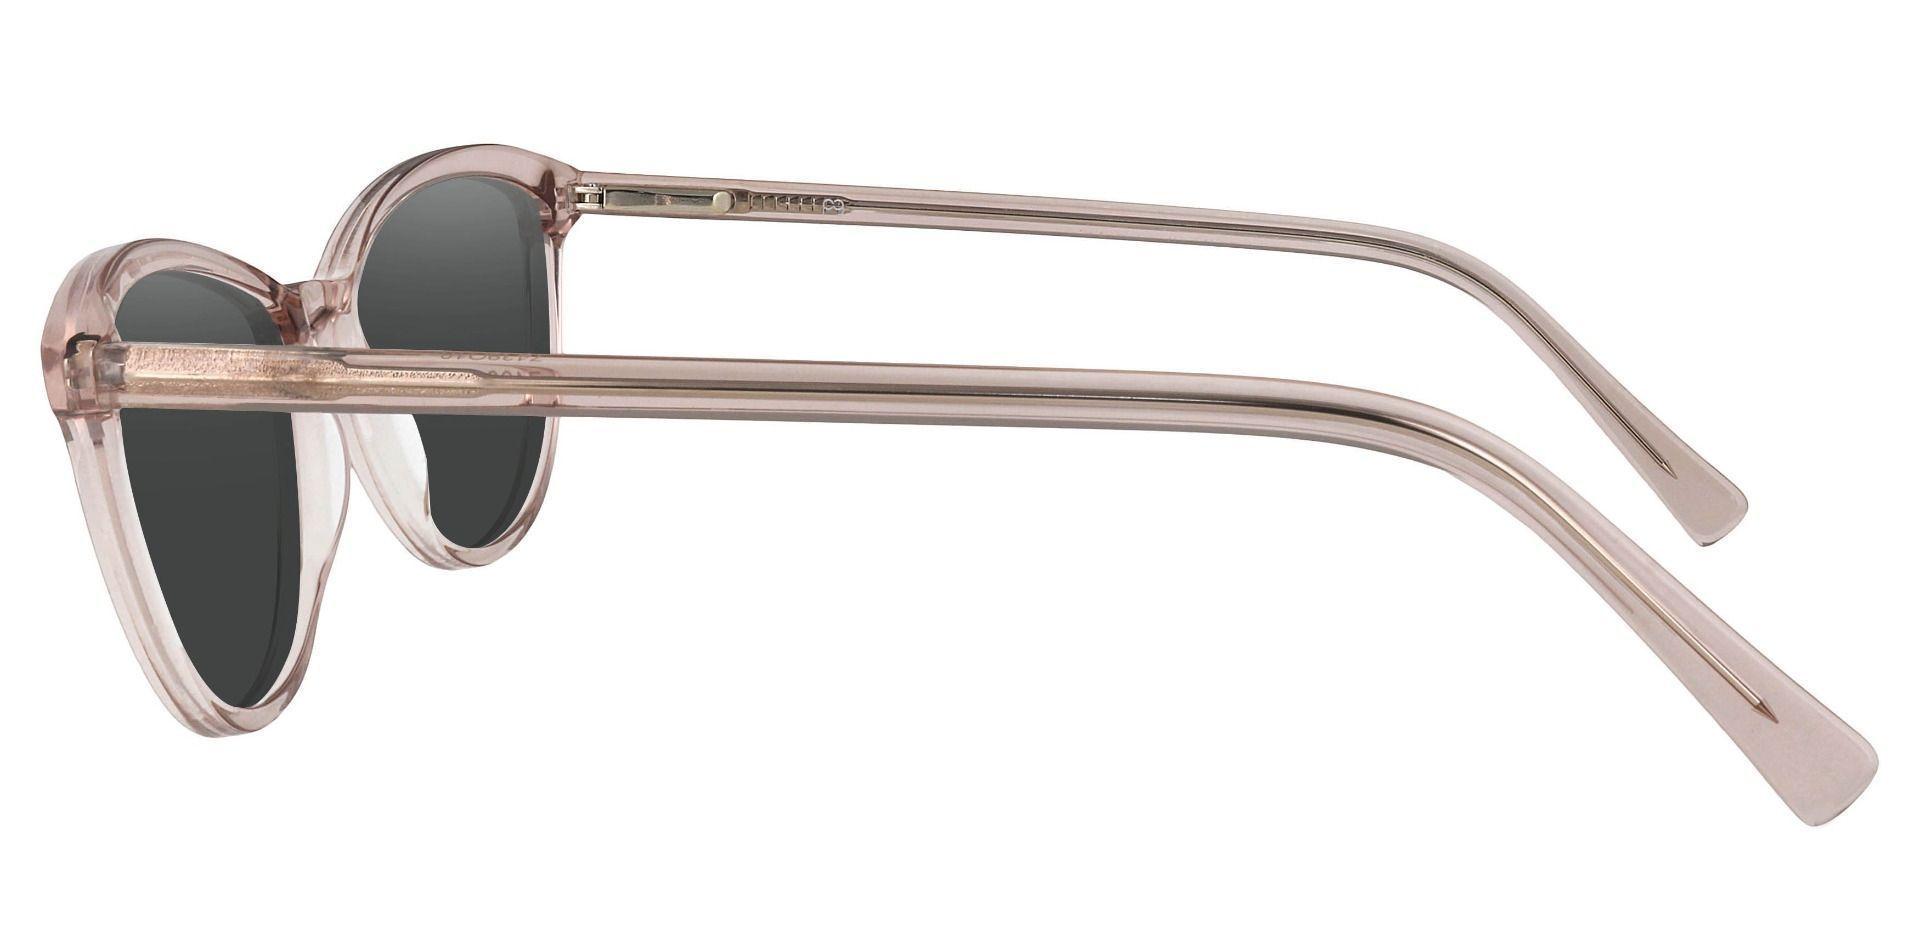 Annie Cat Eye Prescription Sunglasses - Orange Frame With Gray Lenses